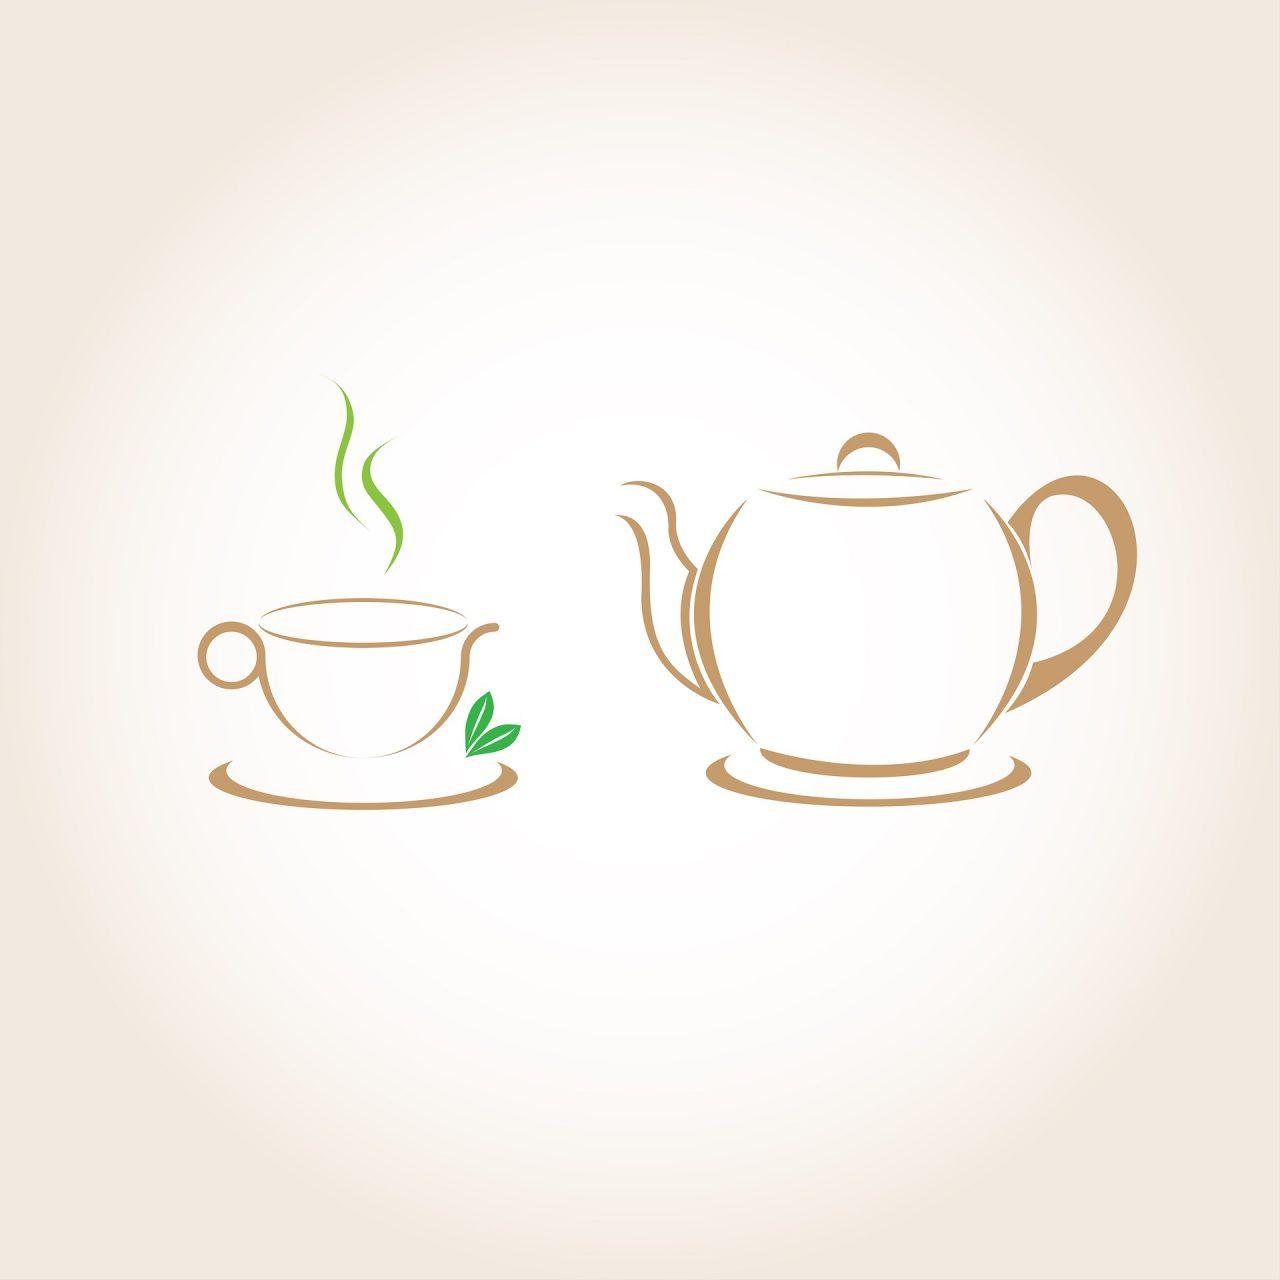 coffe-tea-1280x1280.jpg